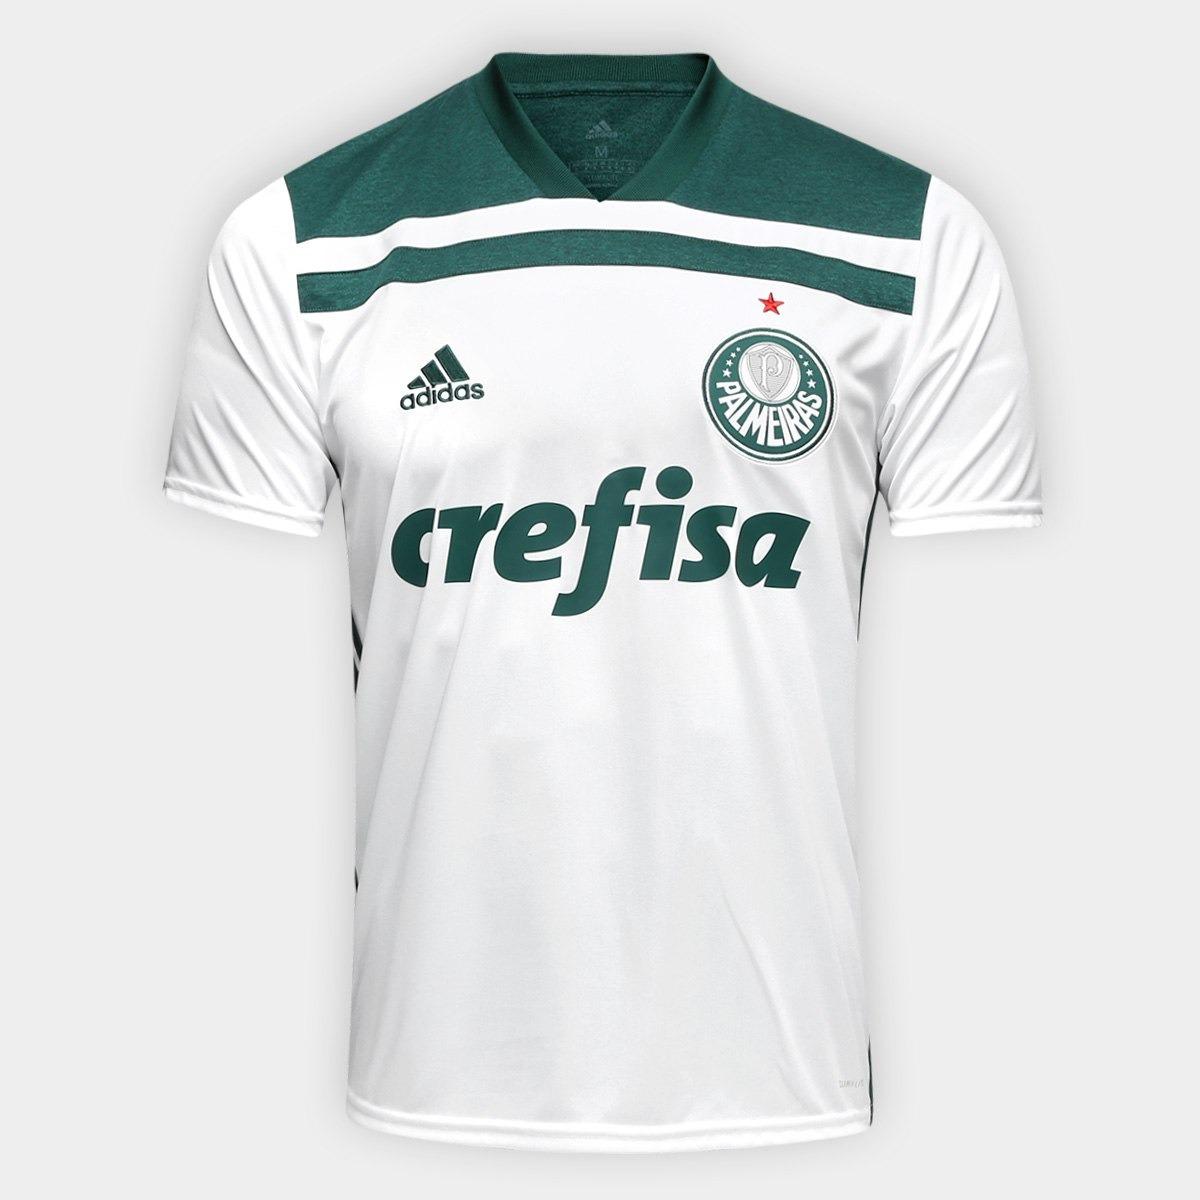 bbacdd15e4 Camisa Camiseta Palmeiras Blusa Away 2018 Frete Gratis - R  120